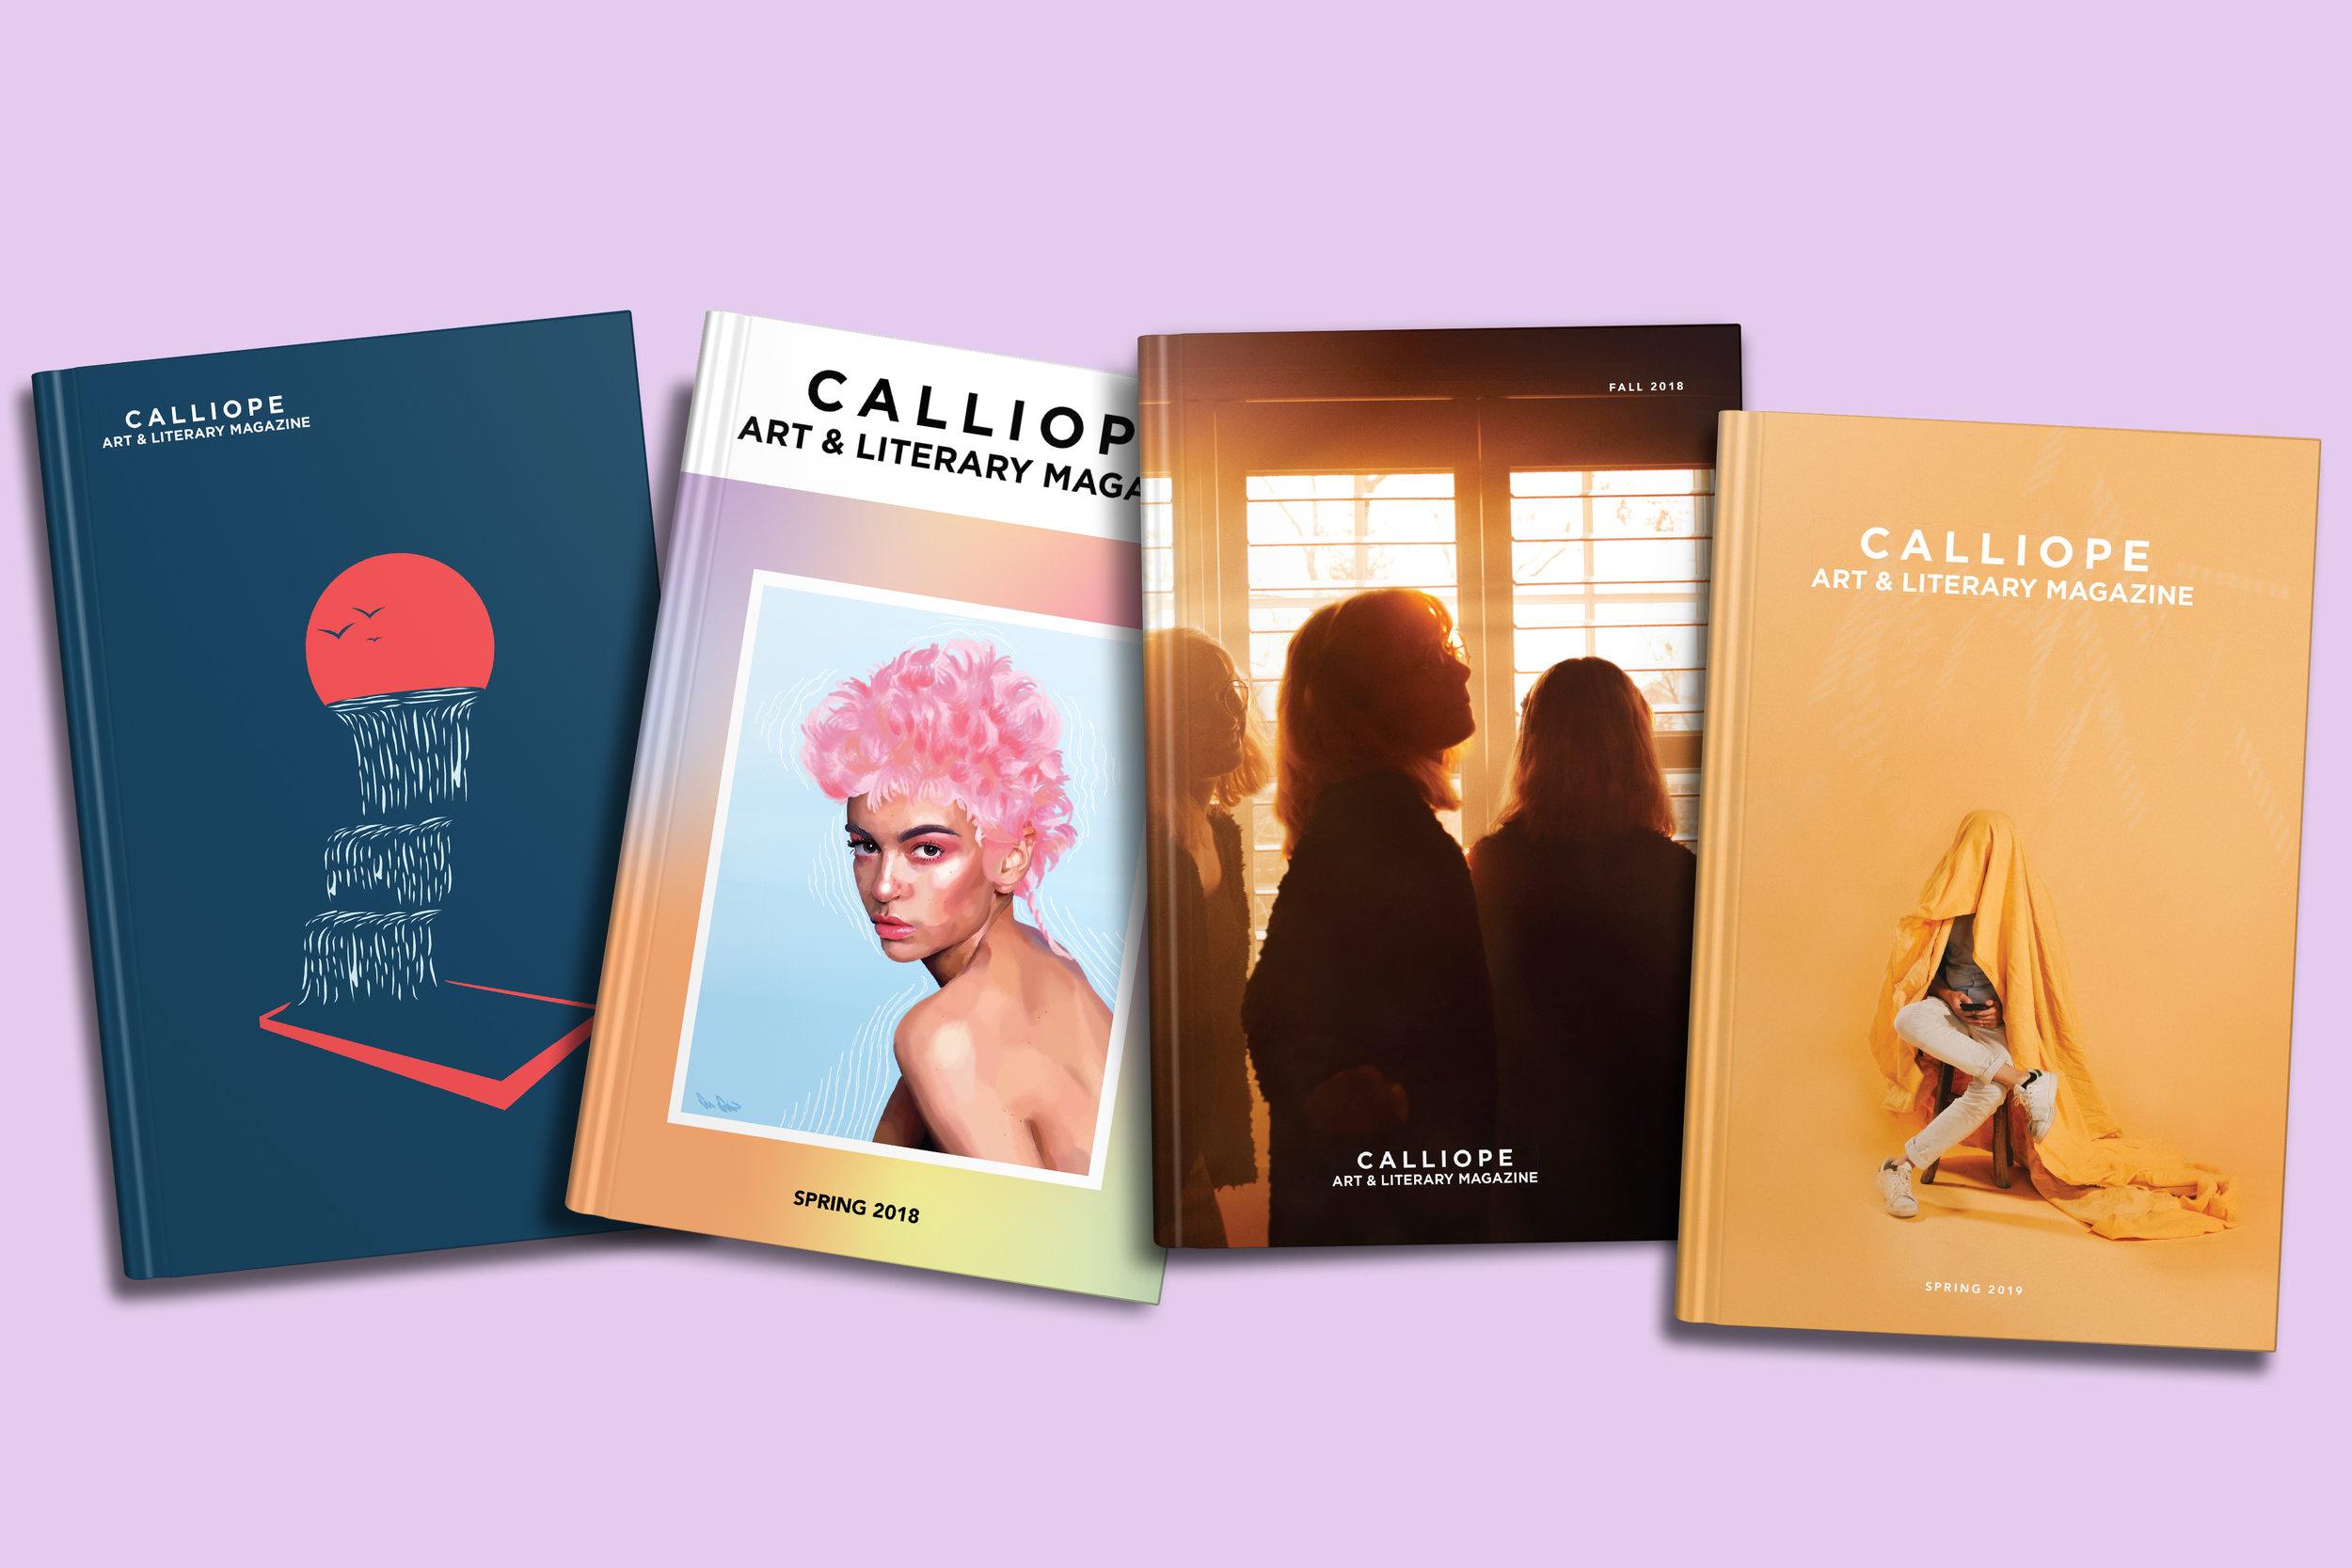 calliopemokcup_covers.jpg